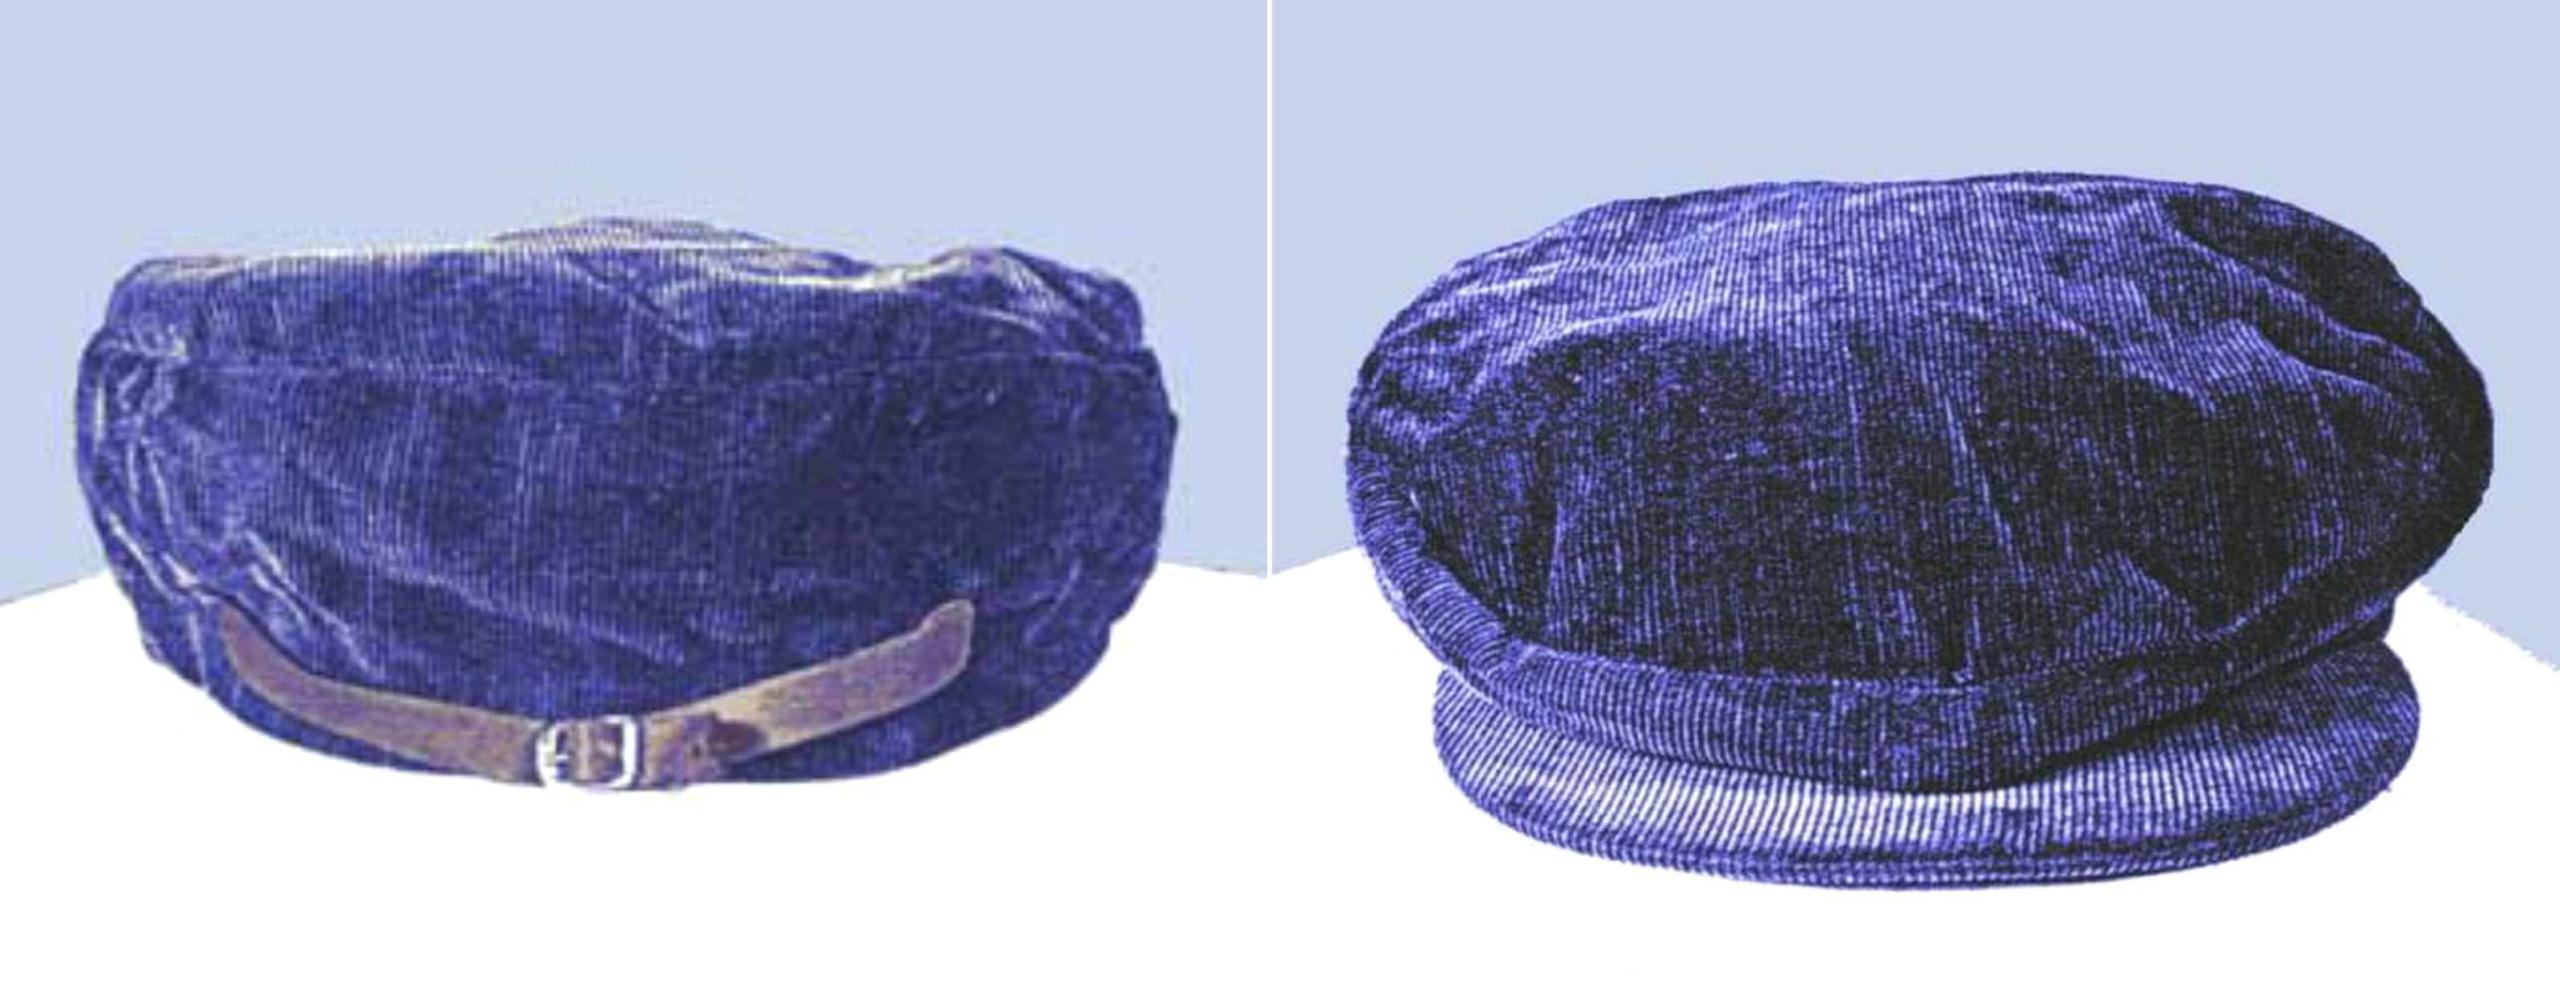 The blue corduroy cap found near the crime scene. © Image Credit: Americasunknownchild